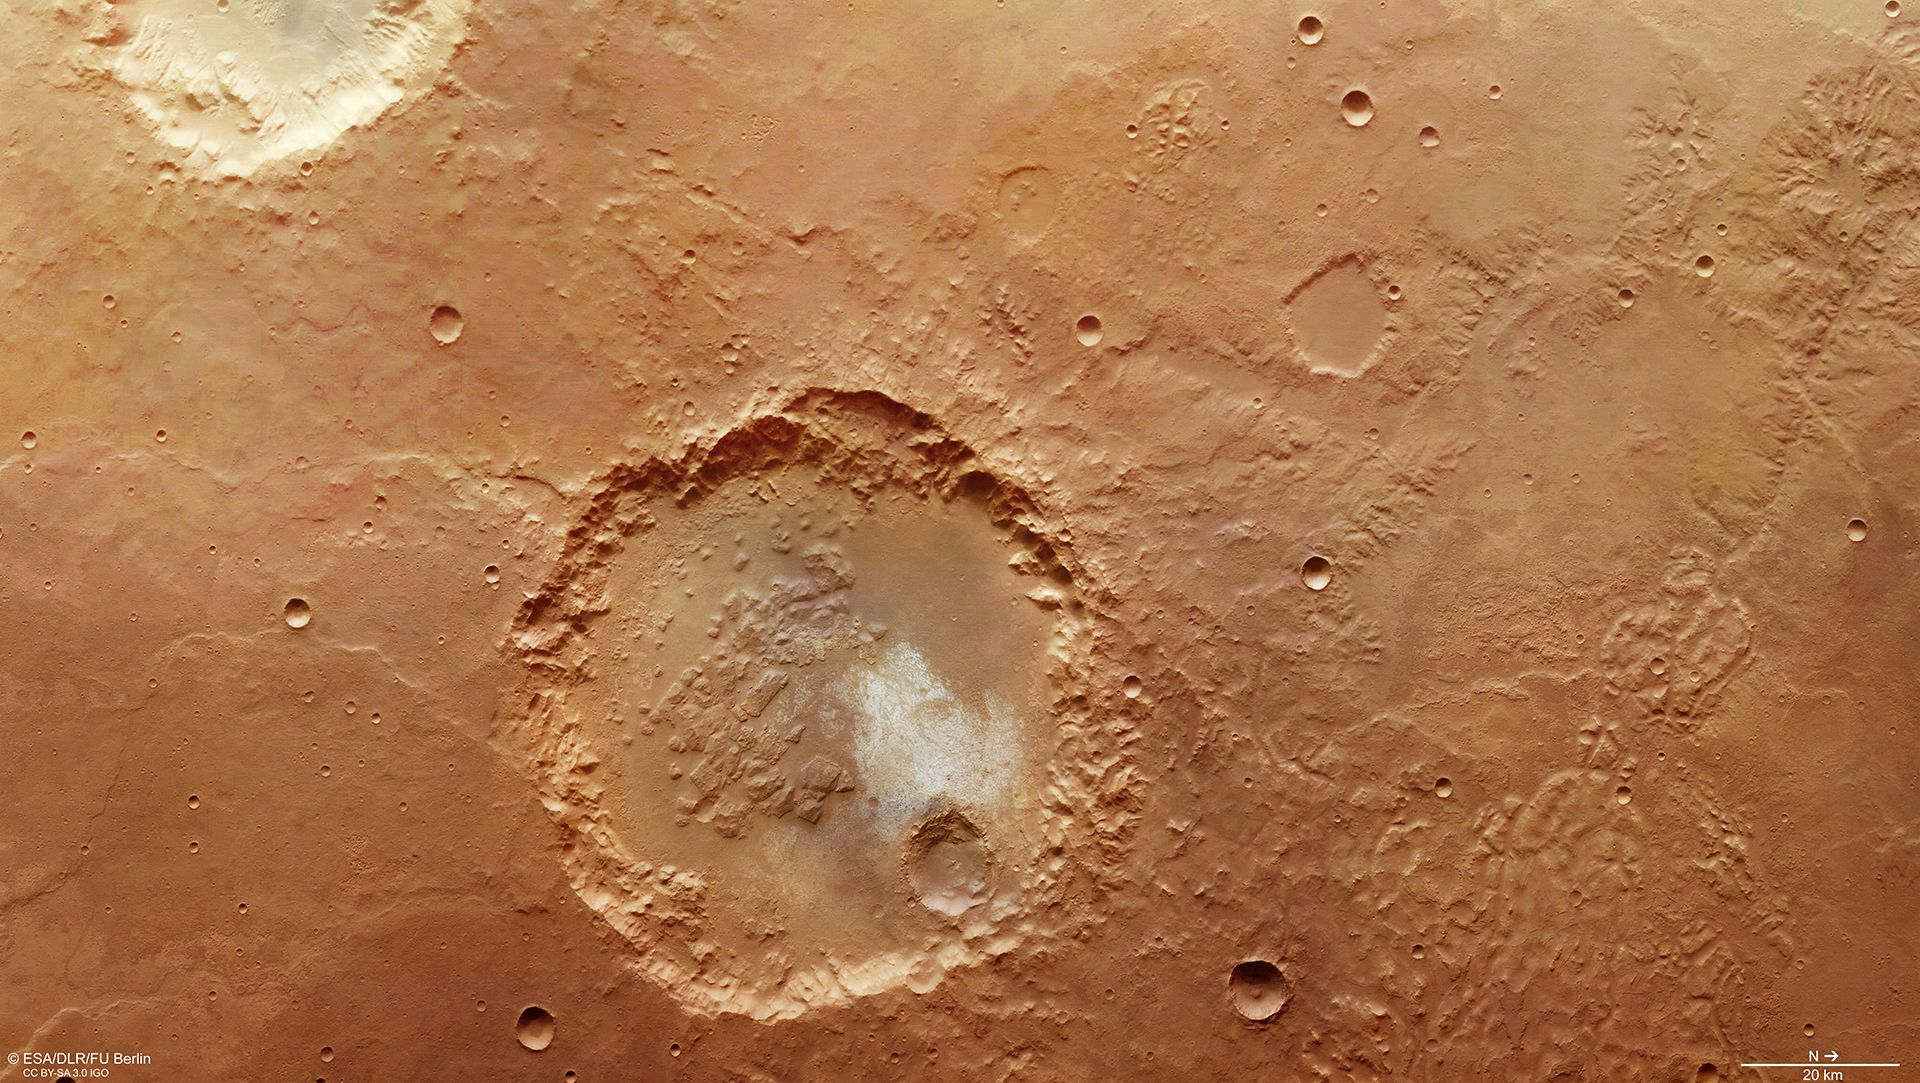 1_11_Mars surface